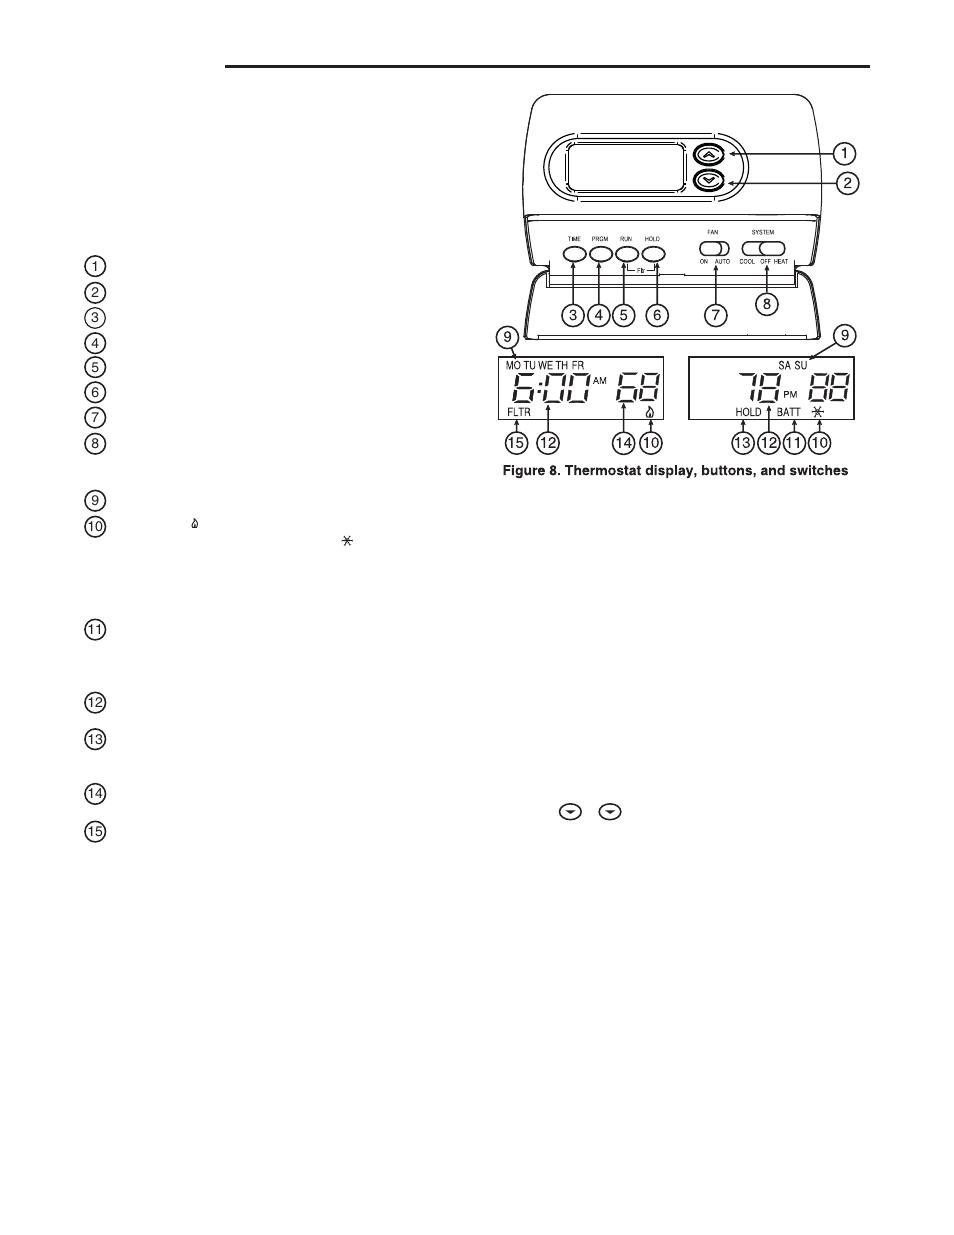 White Rodgers Thermostat Flame Icon Blinking Nemetasaufgegabelt Wiring Diagram 1f80 361 Operation Configuration Menu User Manual Page 4